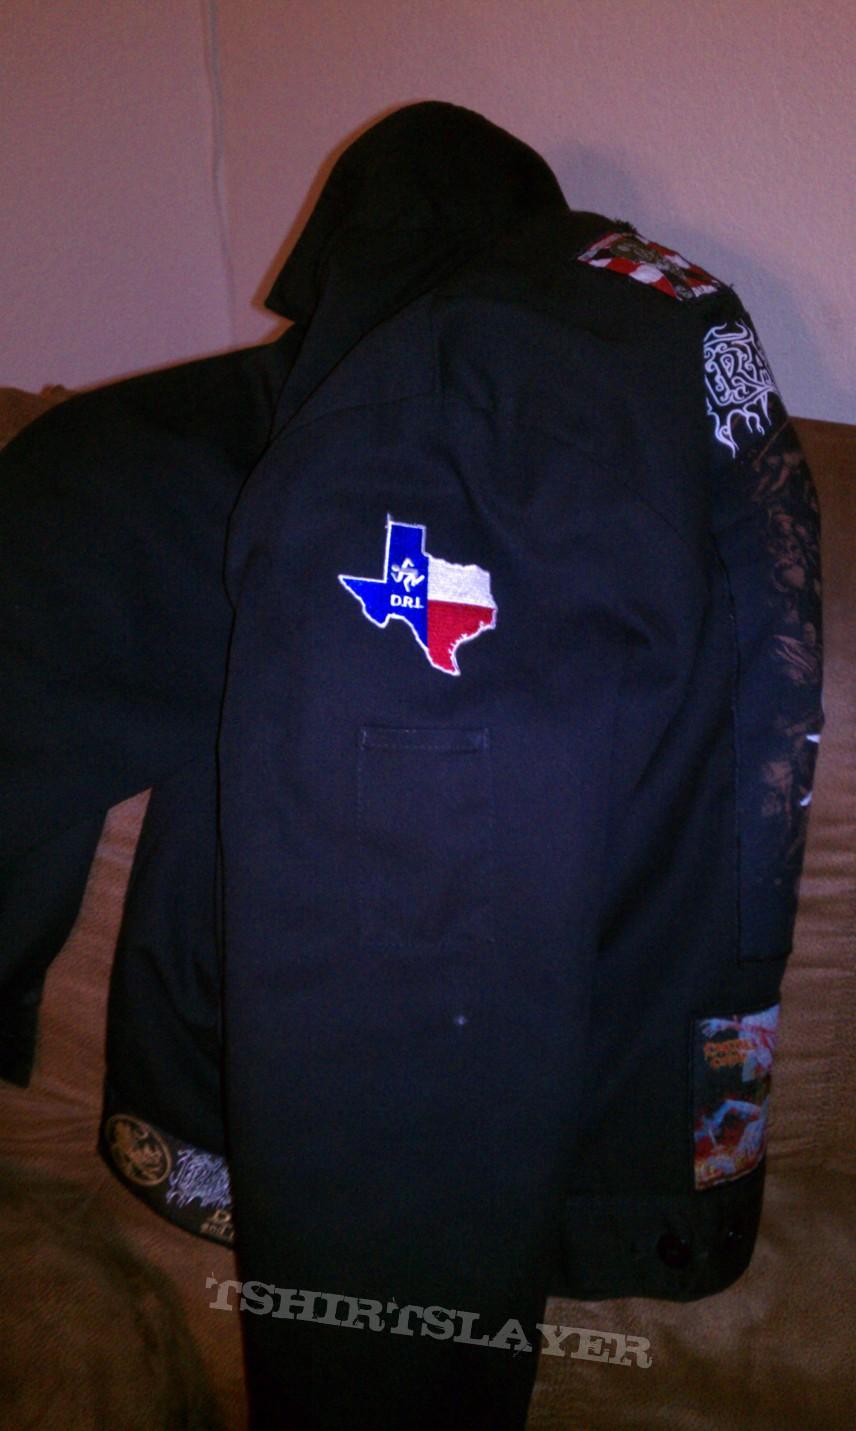 Battle Jacket - One of my jackets!